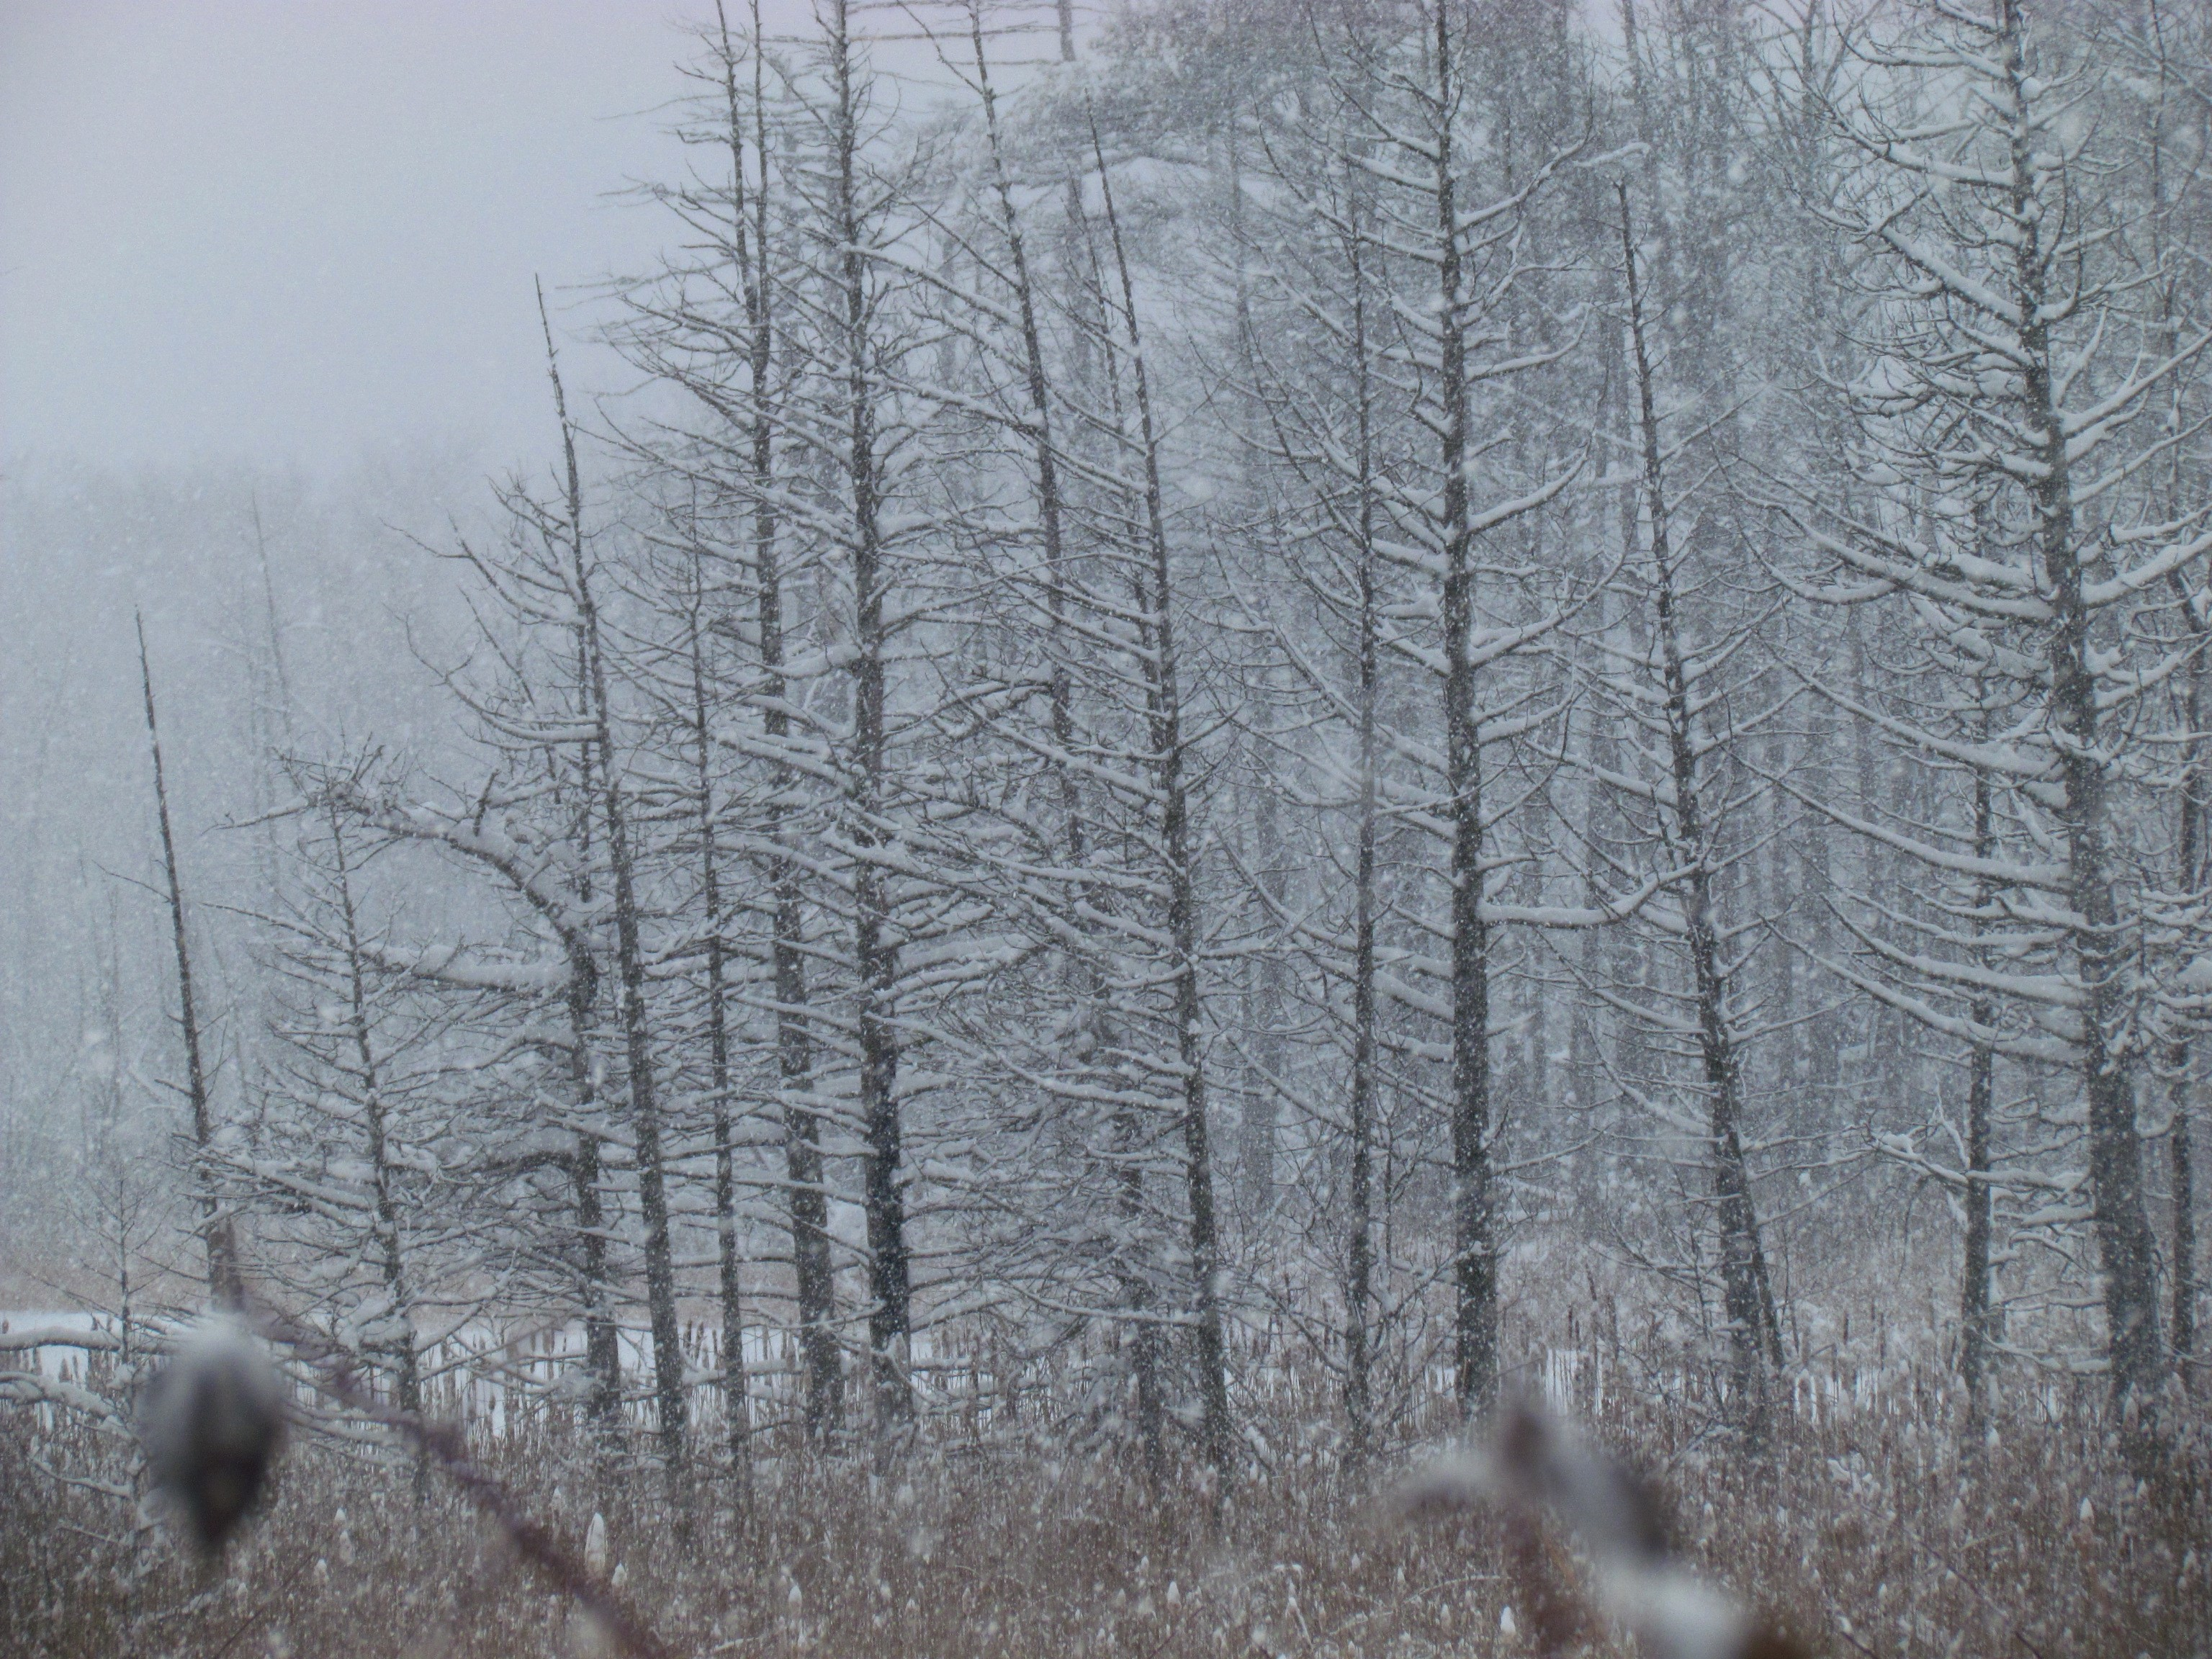 snowy tamarack trees